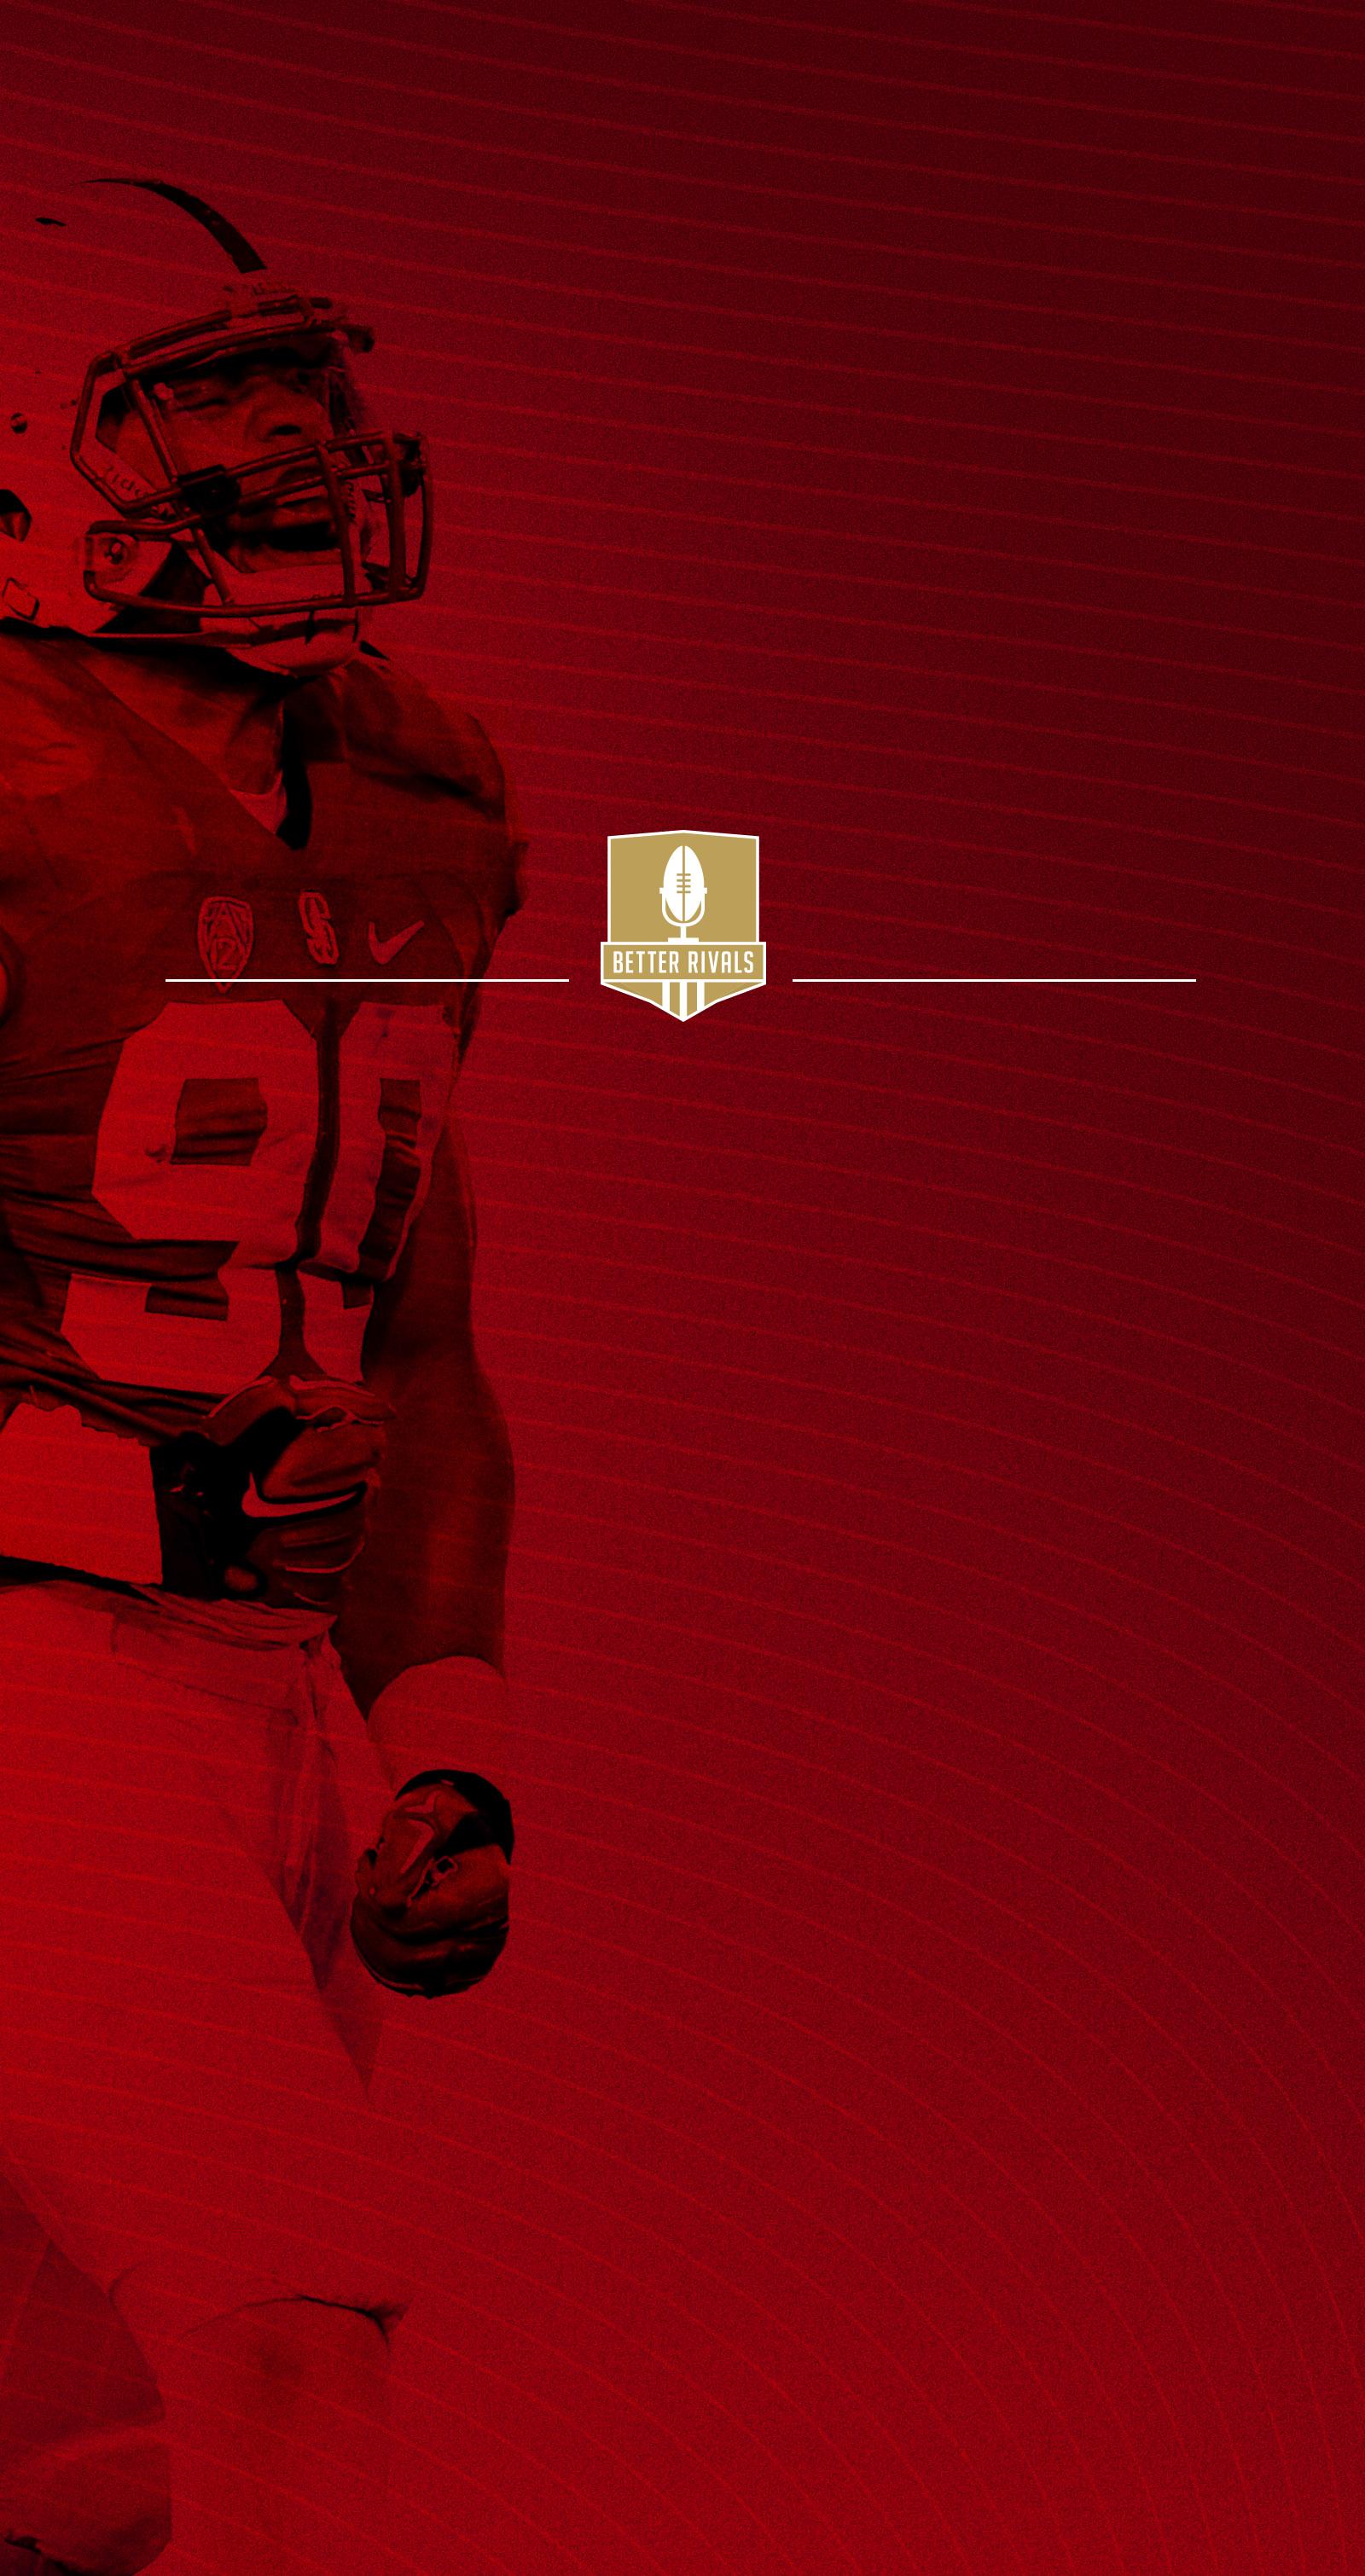 49ers wallpapers wallpapertag - 49ers wallpaper iphone 5 ...